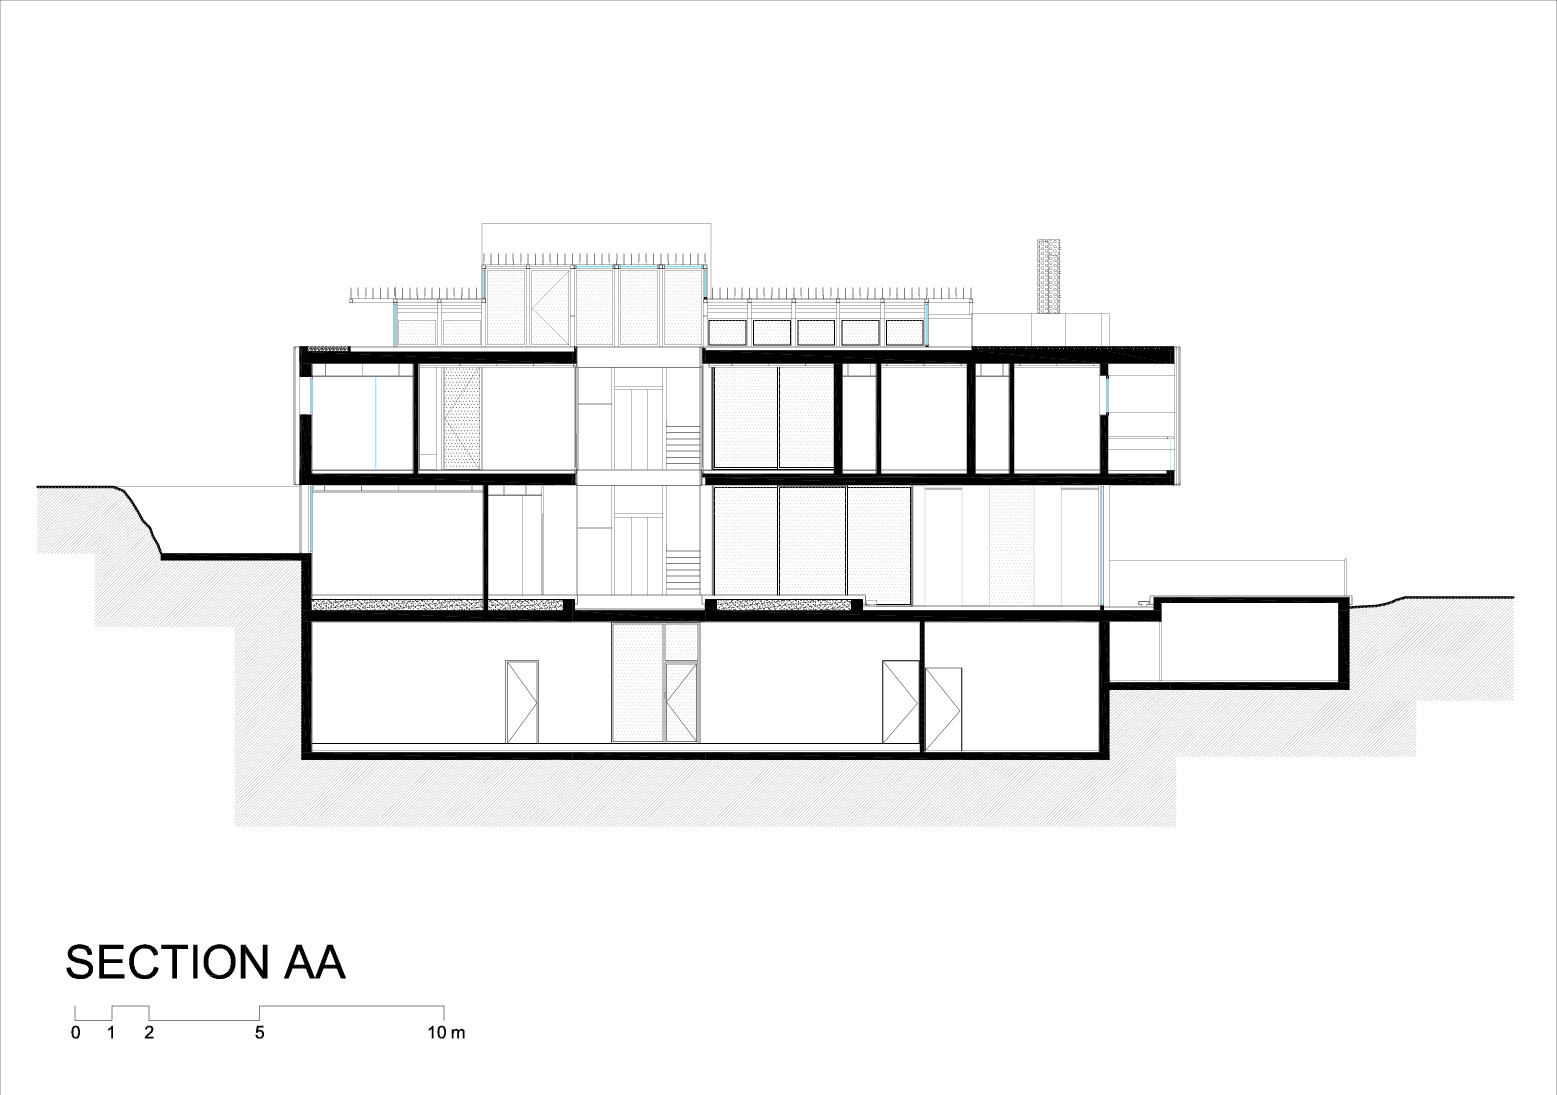 Villa Savoye Front Elevation : Gallery of tahan villa blankpage architects